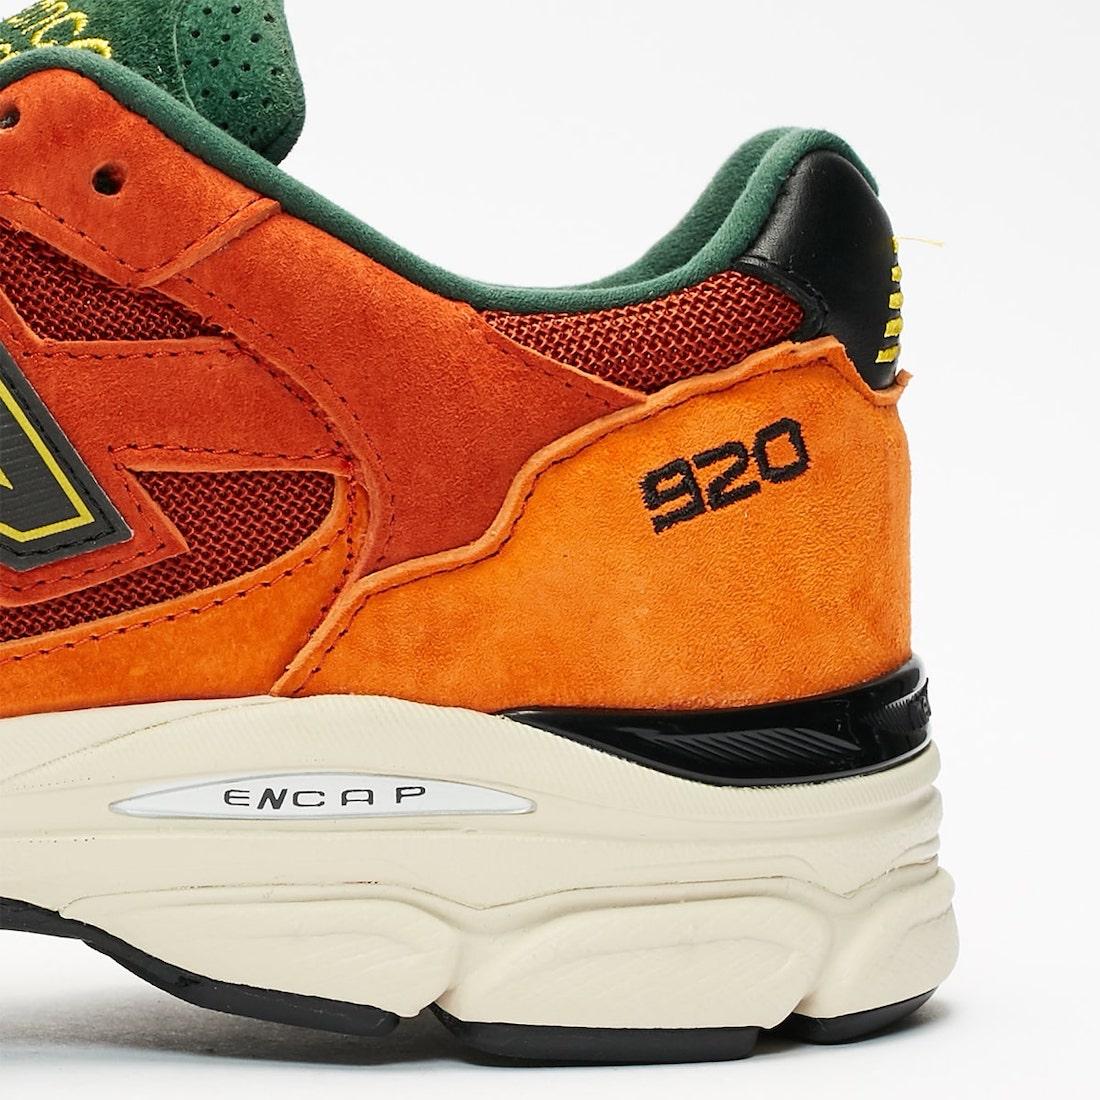 SNS x New Balance 920